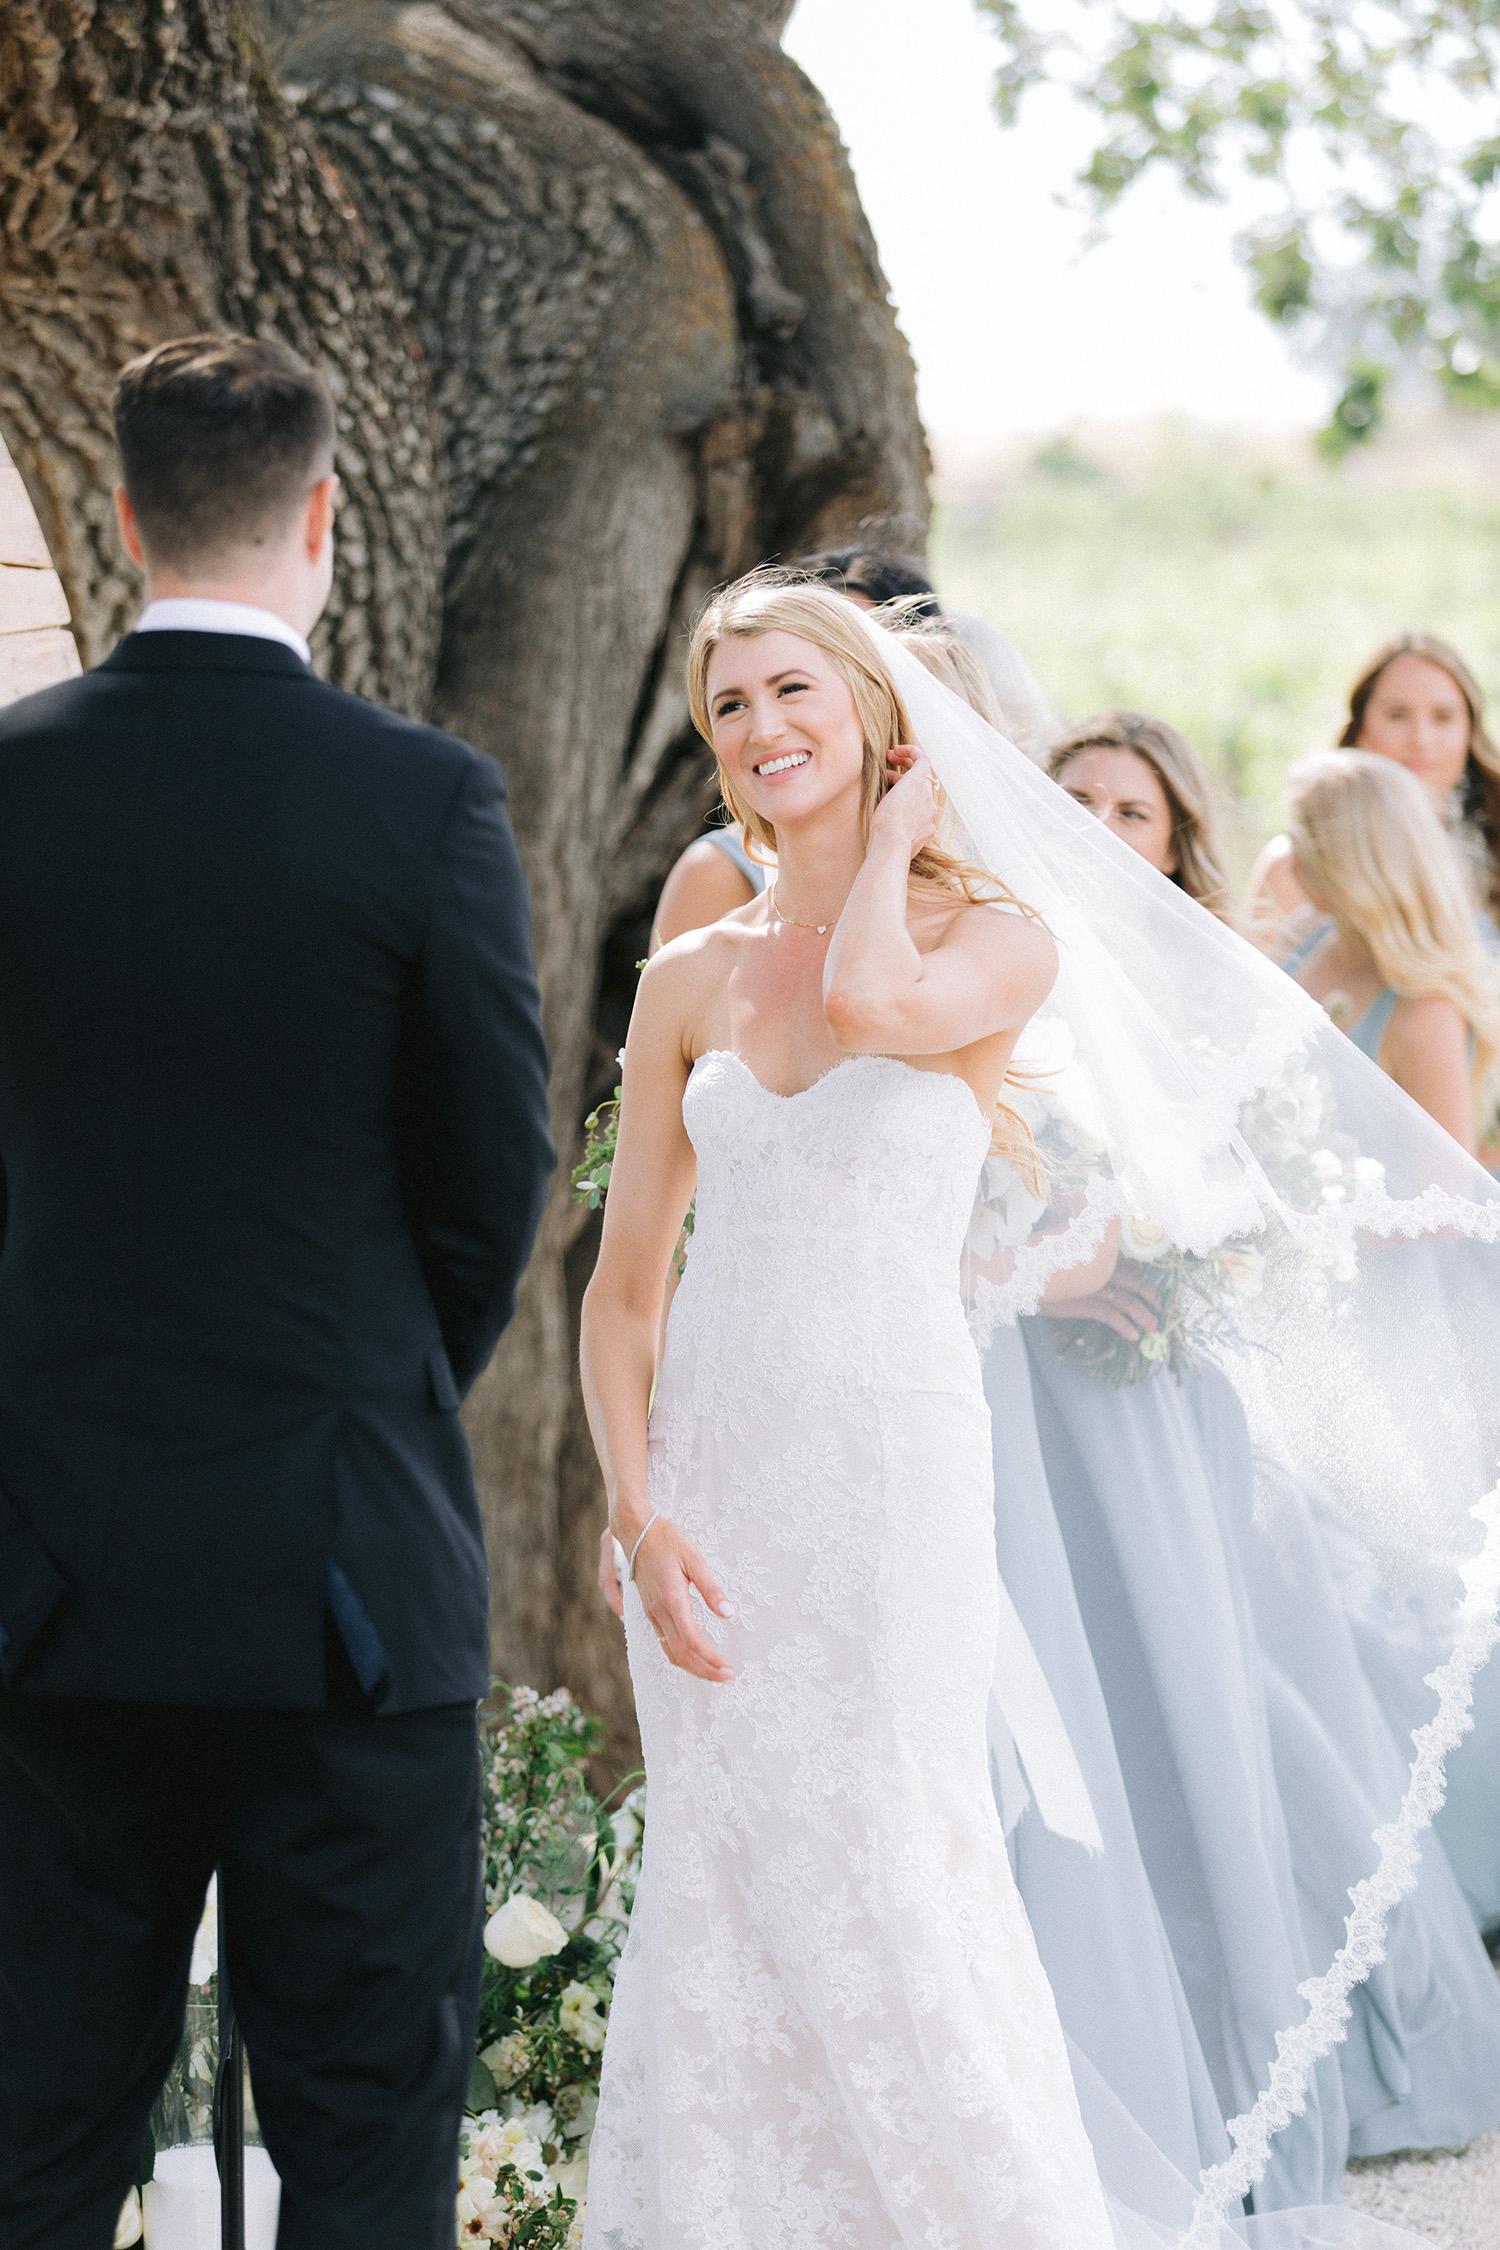 kati erik wedding bride groom alter ceremony